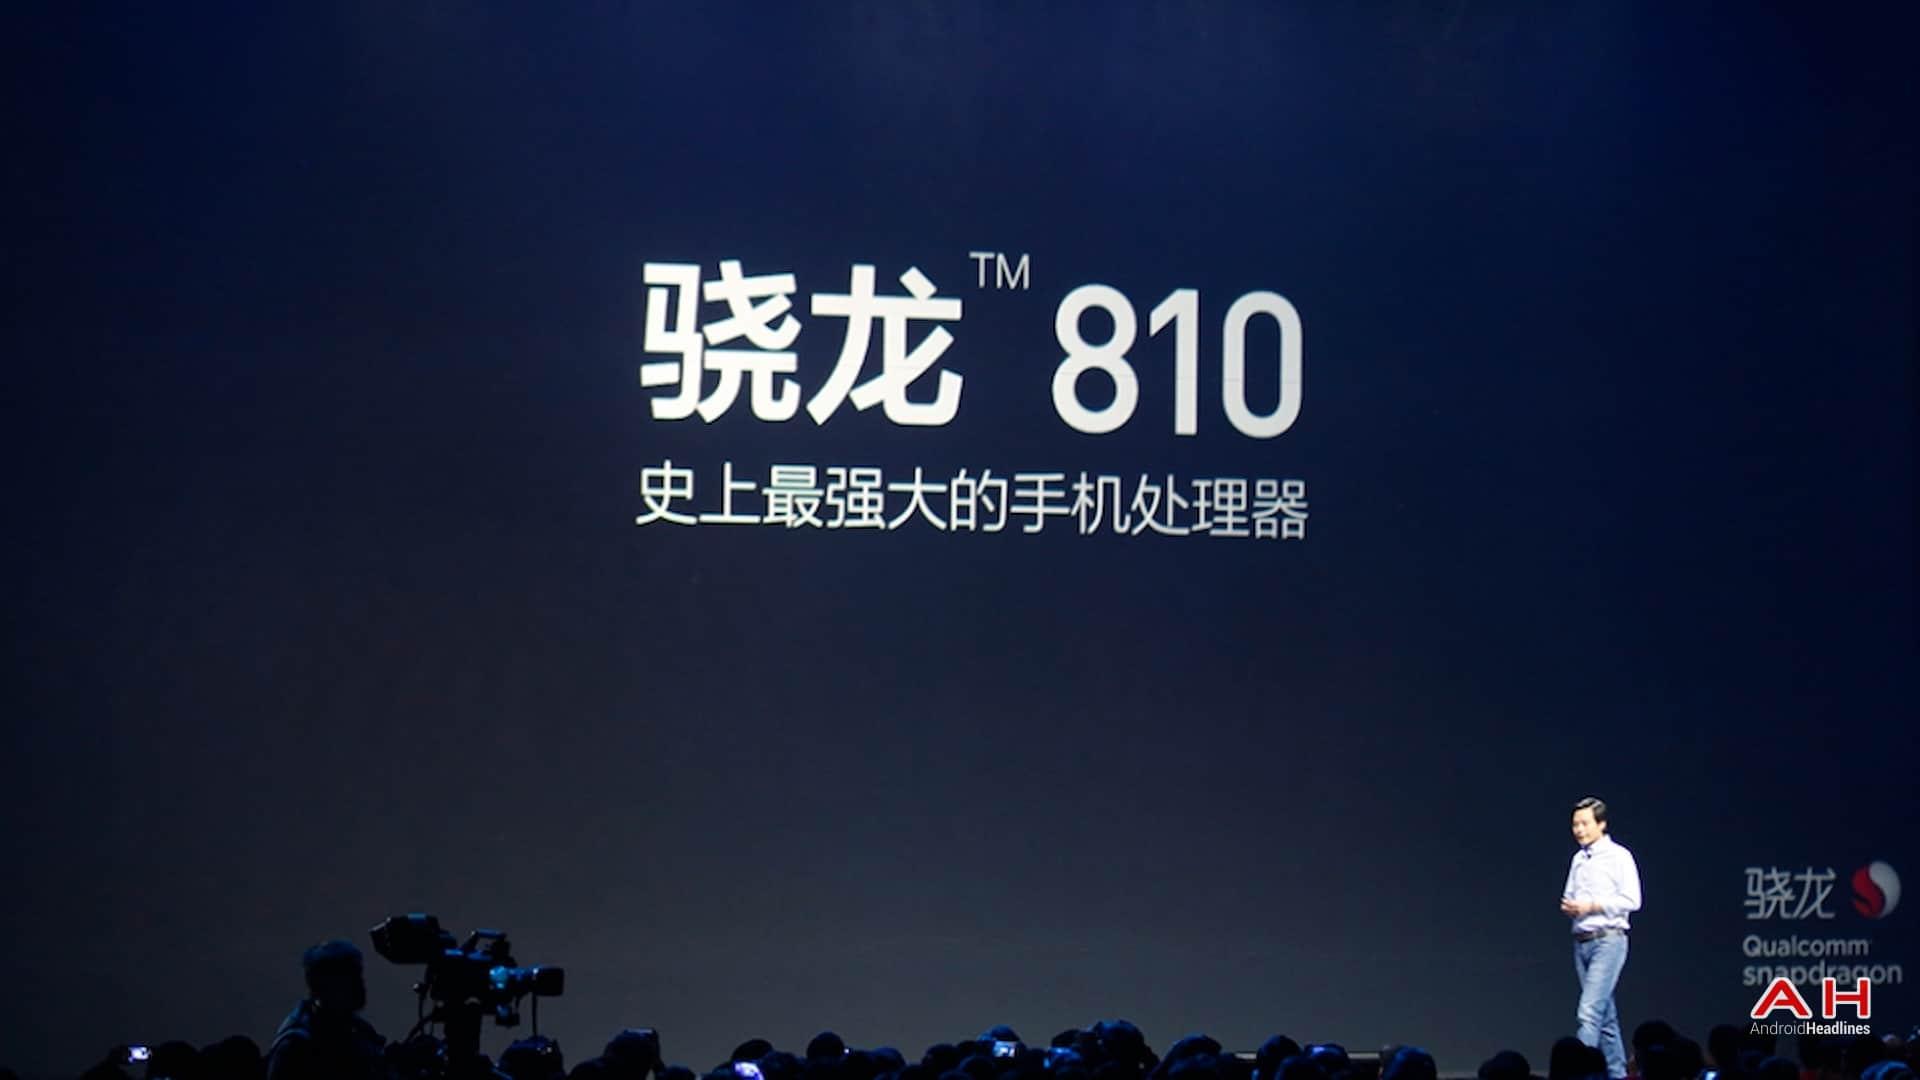 AH Xiaomi Note 21